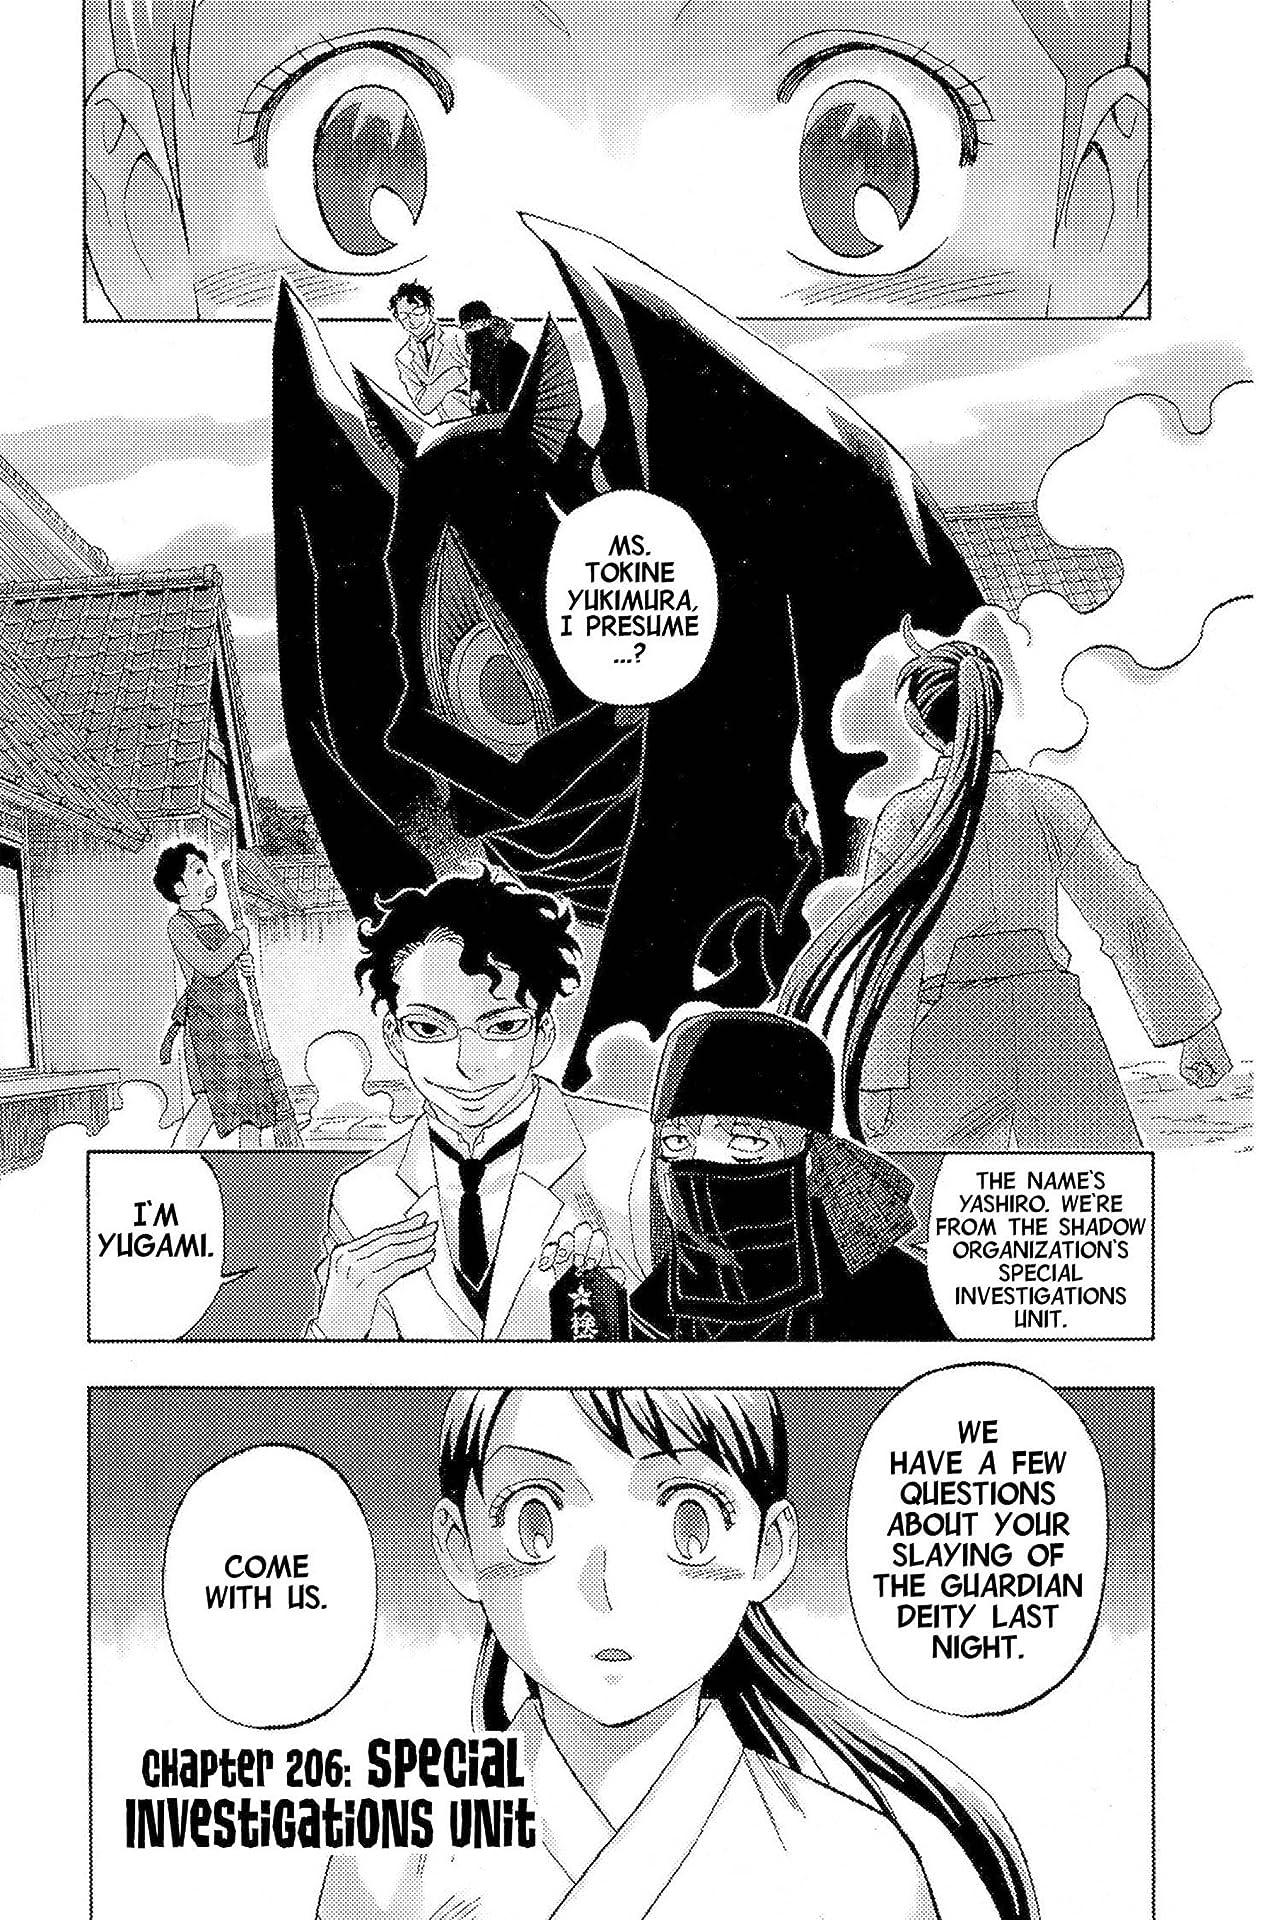 Kekkaishi Vol. 22